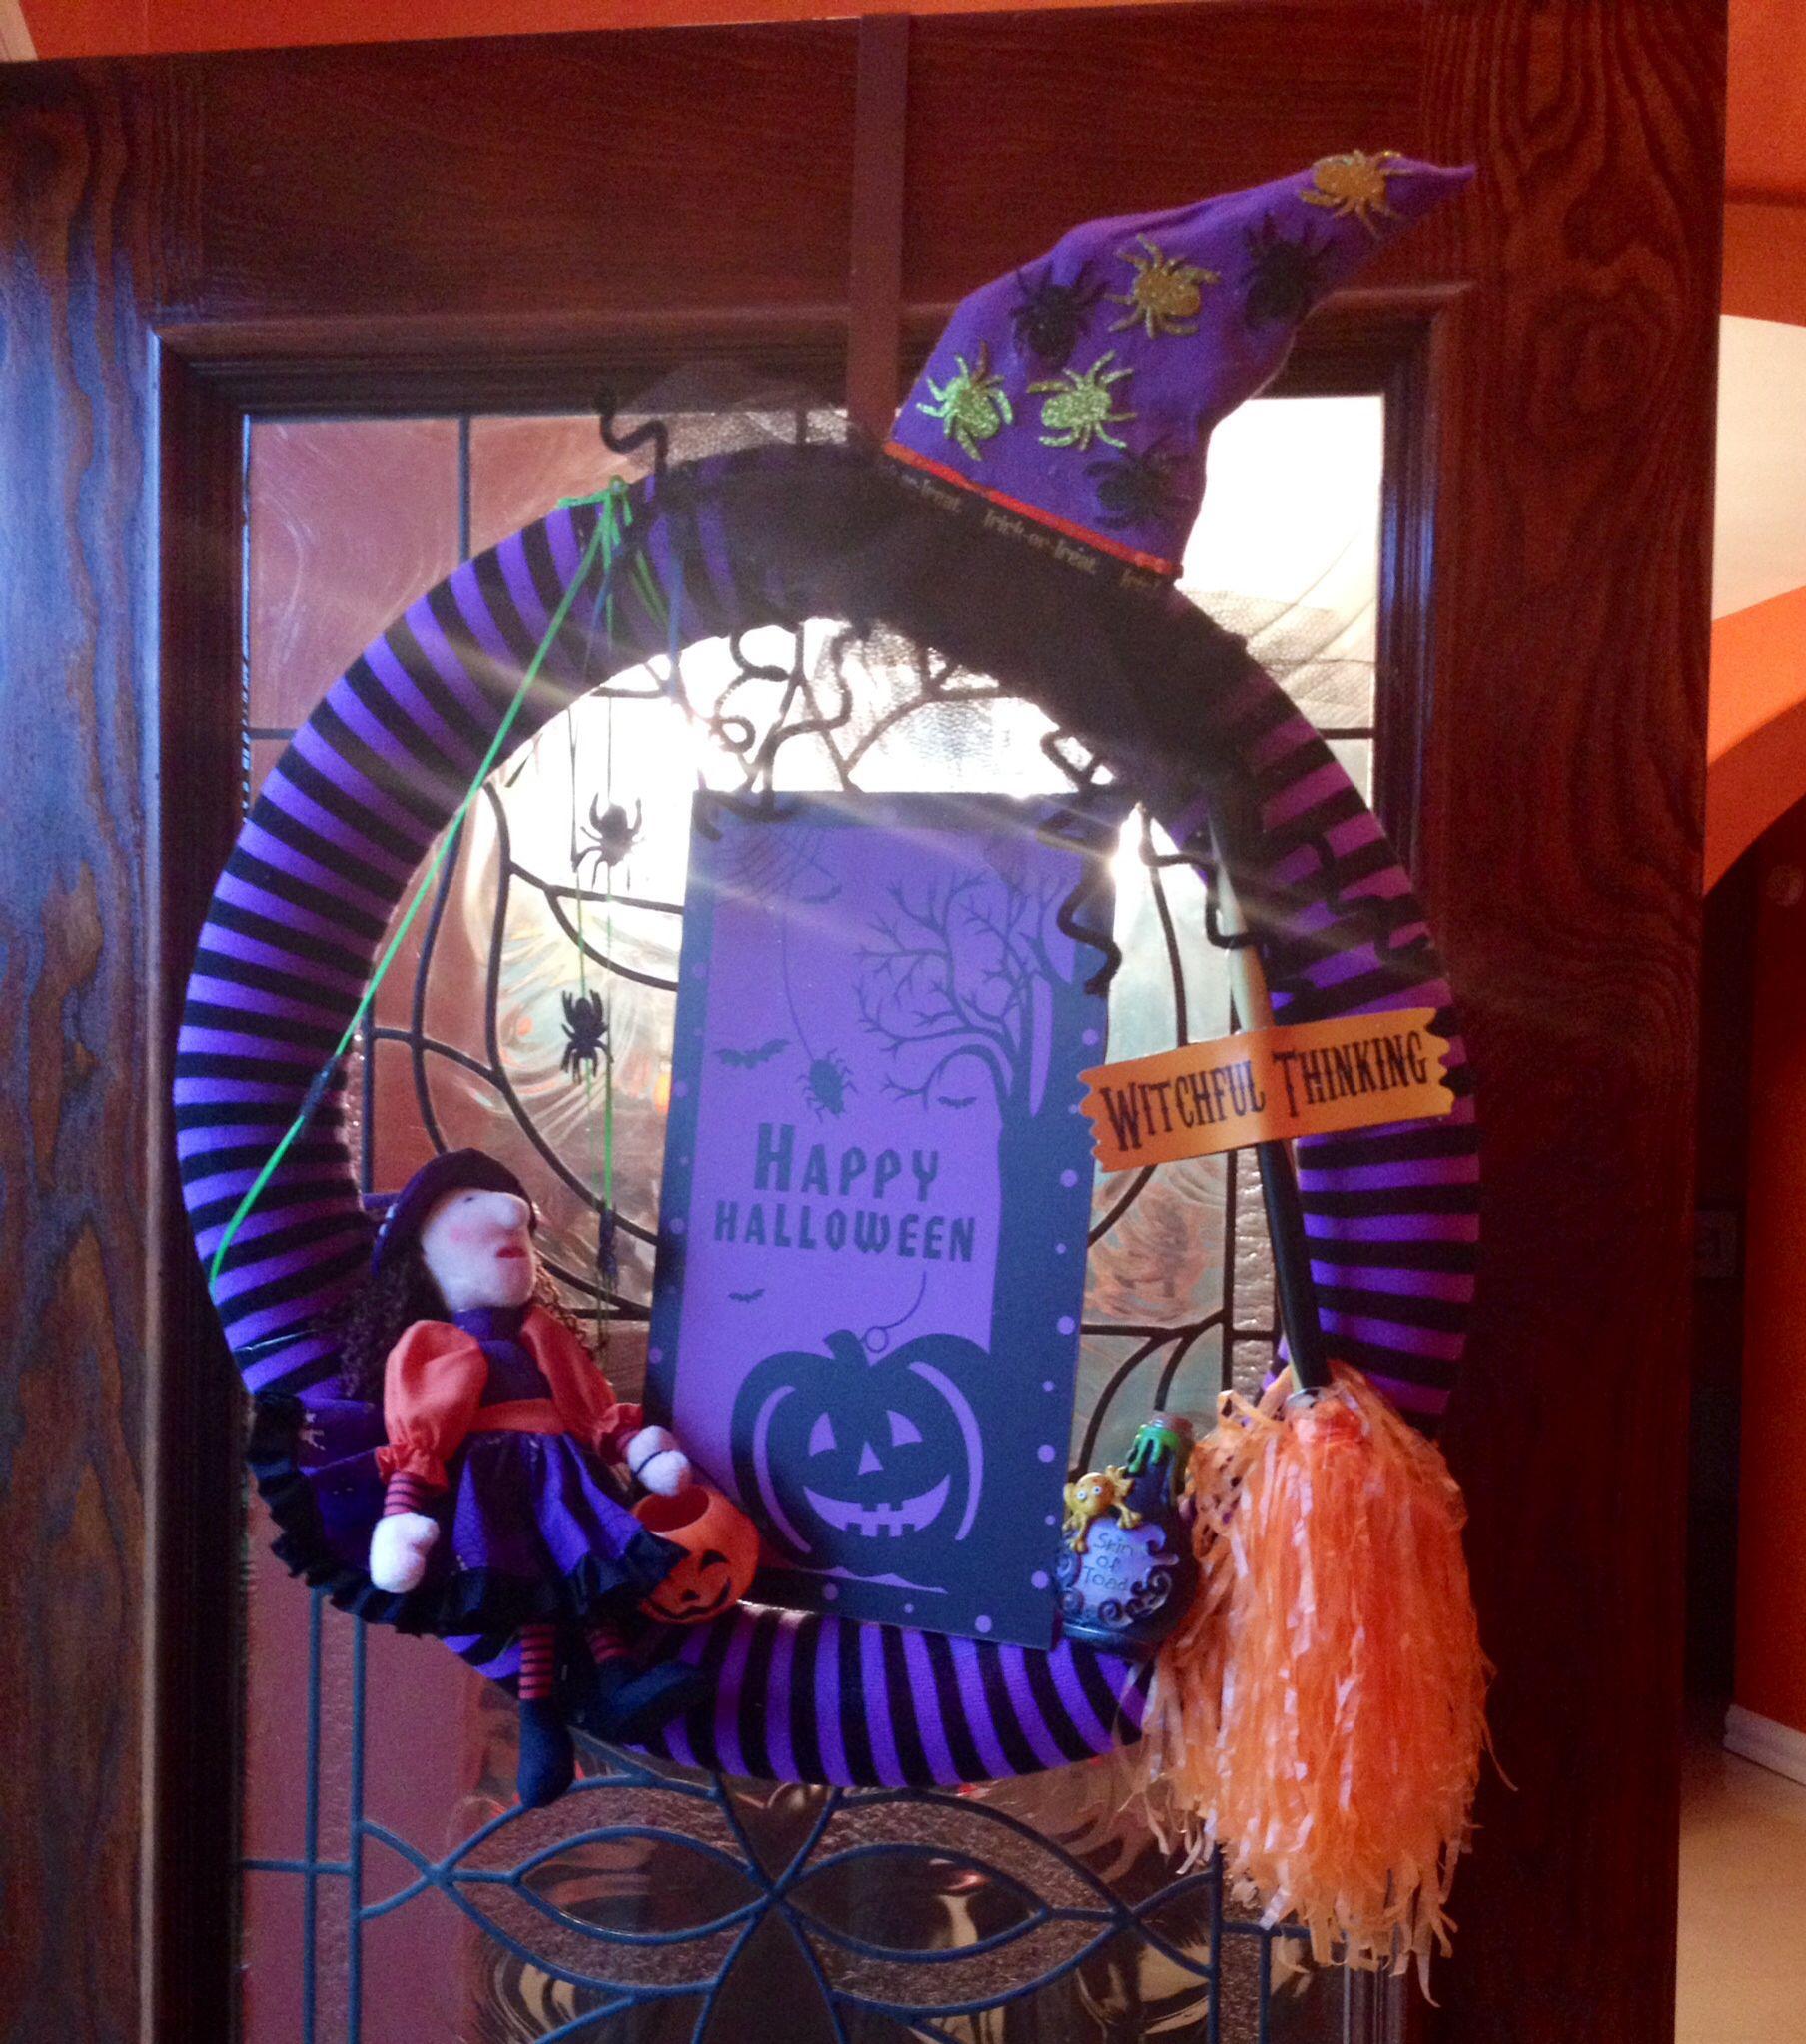 Halloween wreath dollar store hula hoop covered with pool